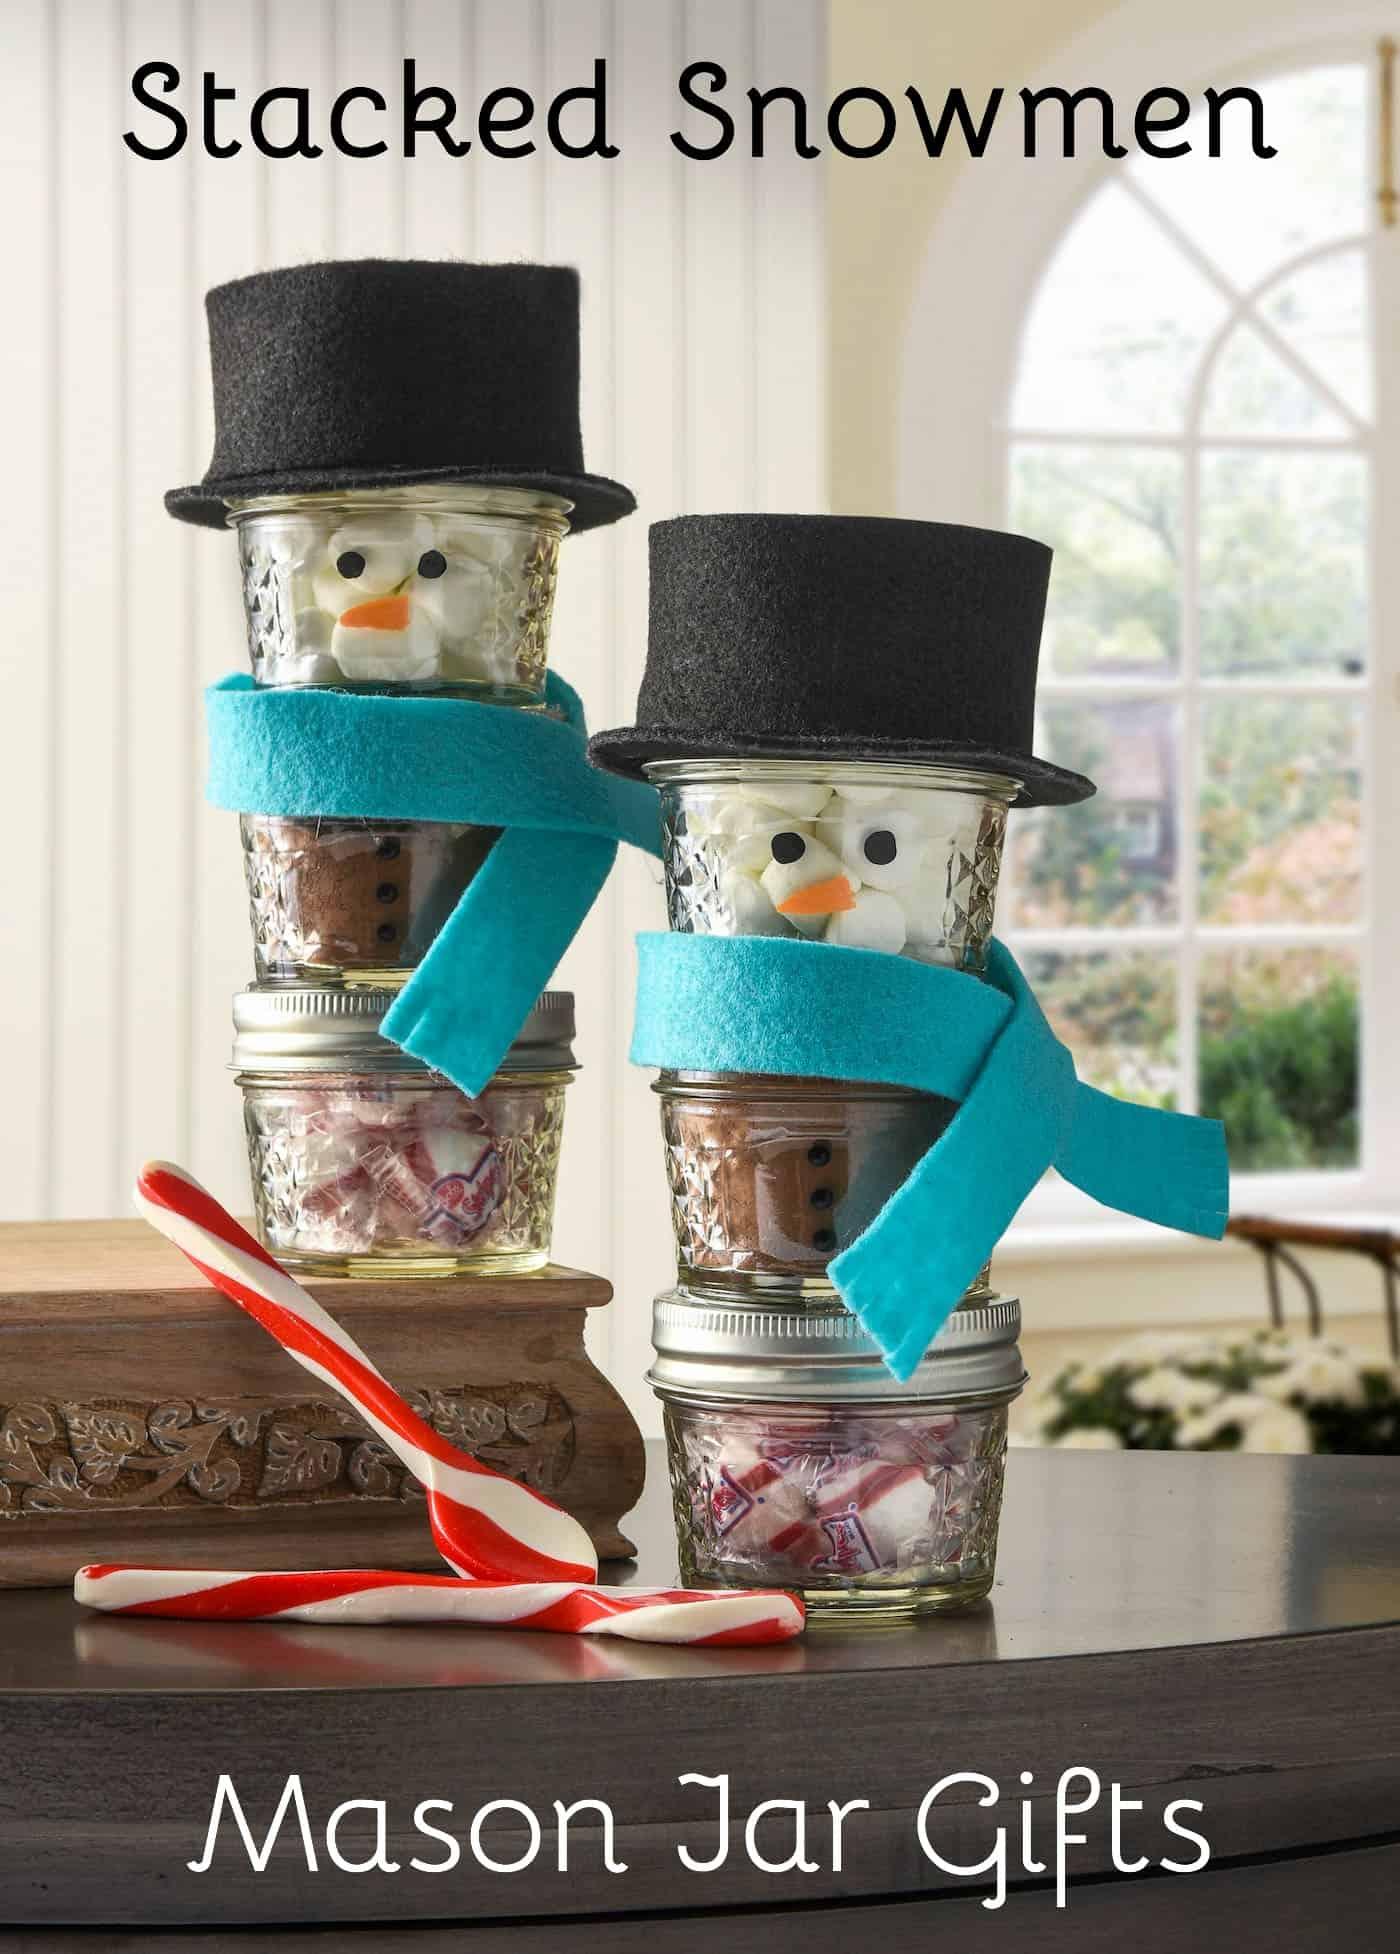 Stacked Snowman Hot Cocoa Mason Jar Gifts Mod Podge Rocks